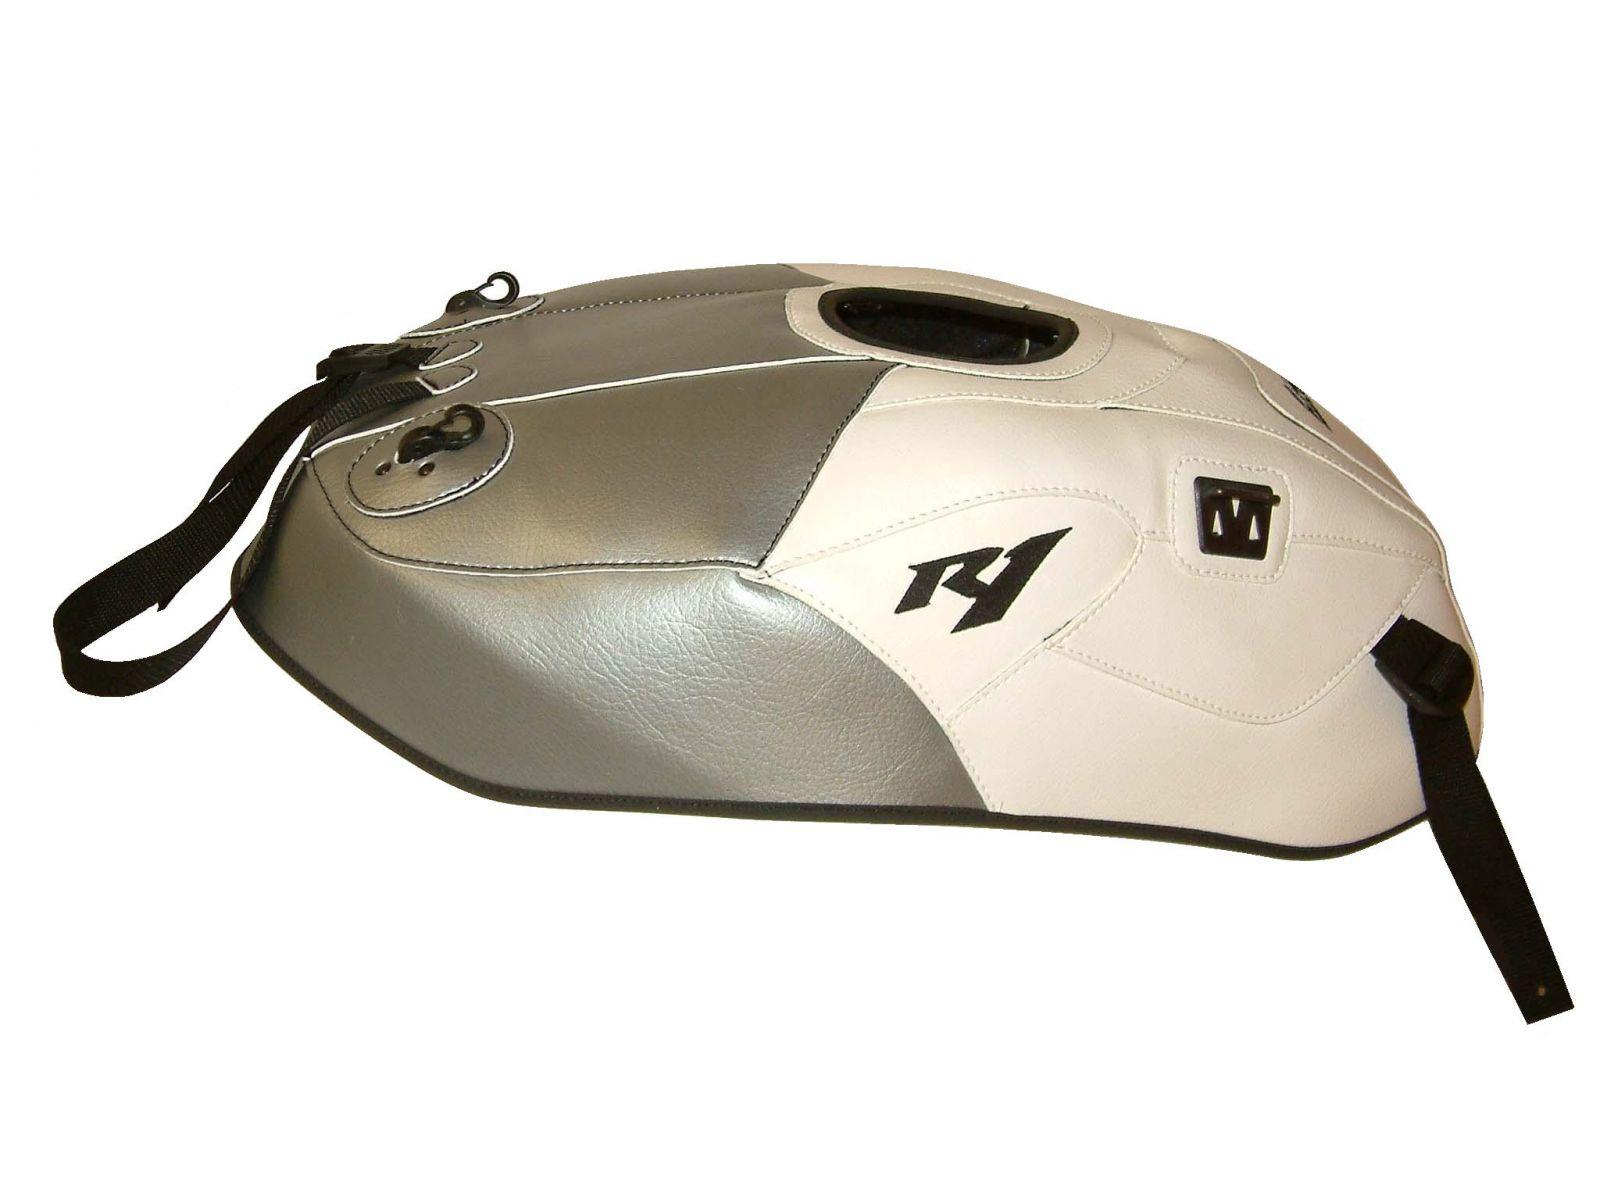 Capa de depósito TPR5997 - YAMAHA YZF R1 [2009-2010]